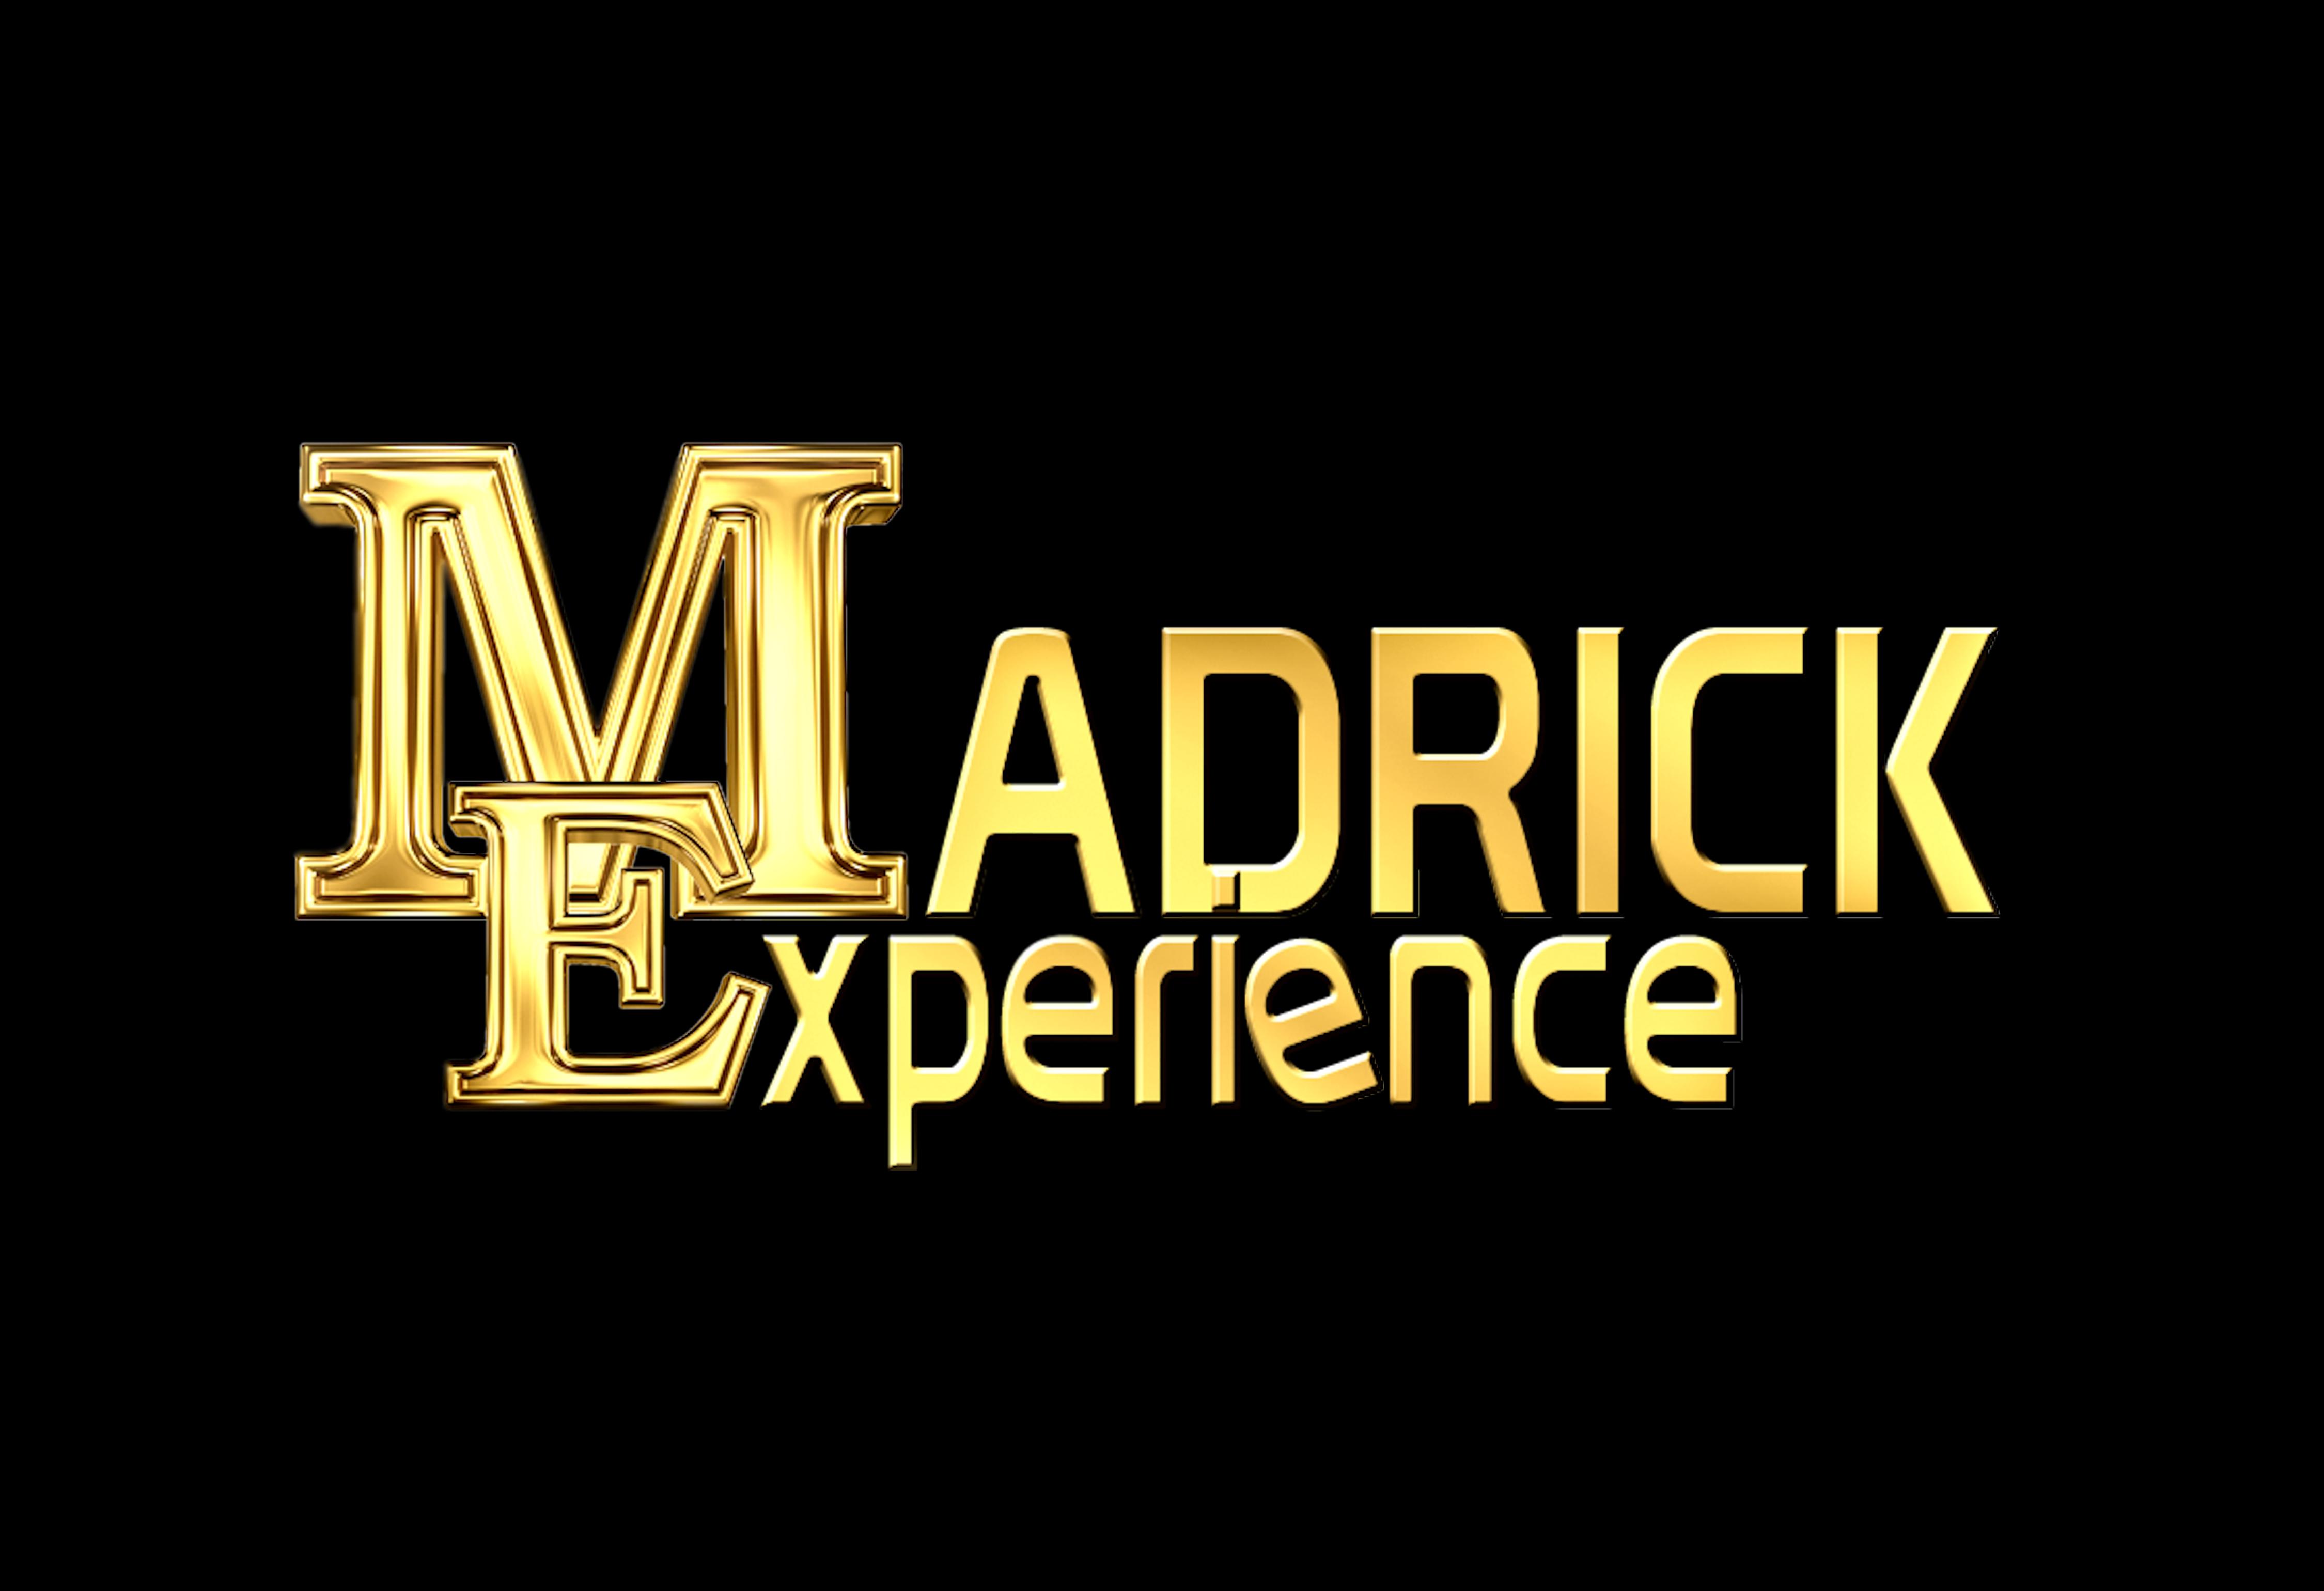 MADRICK